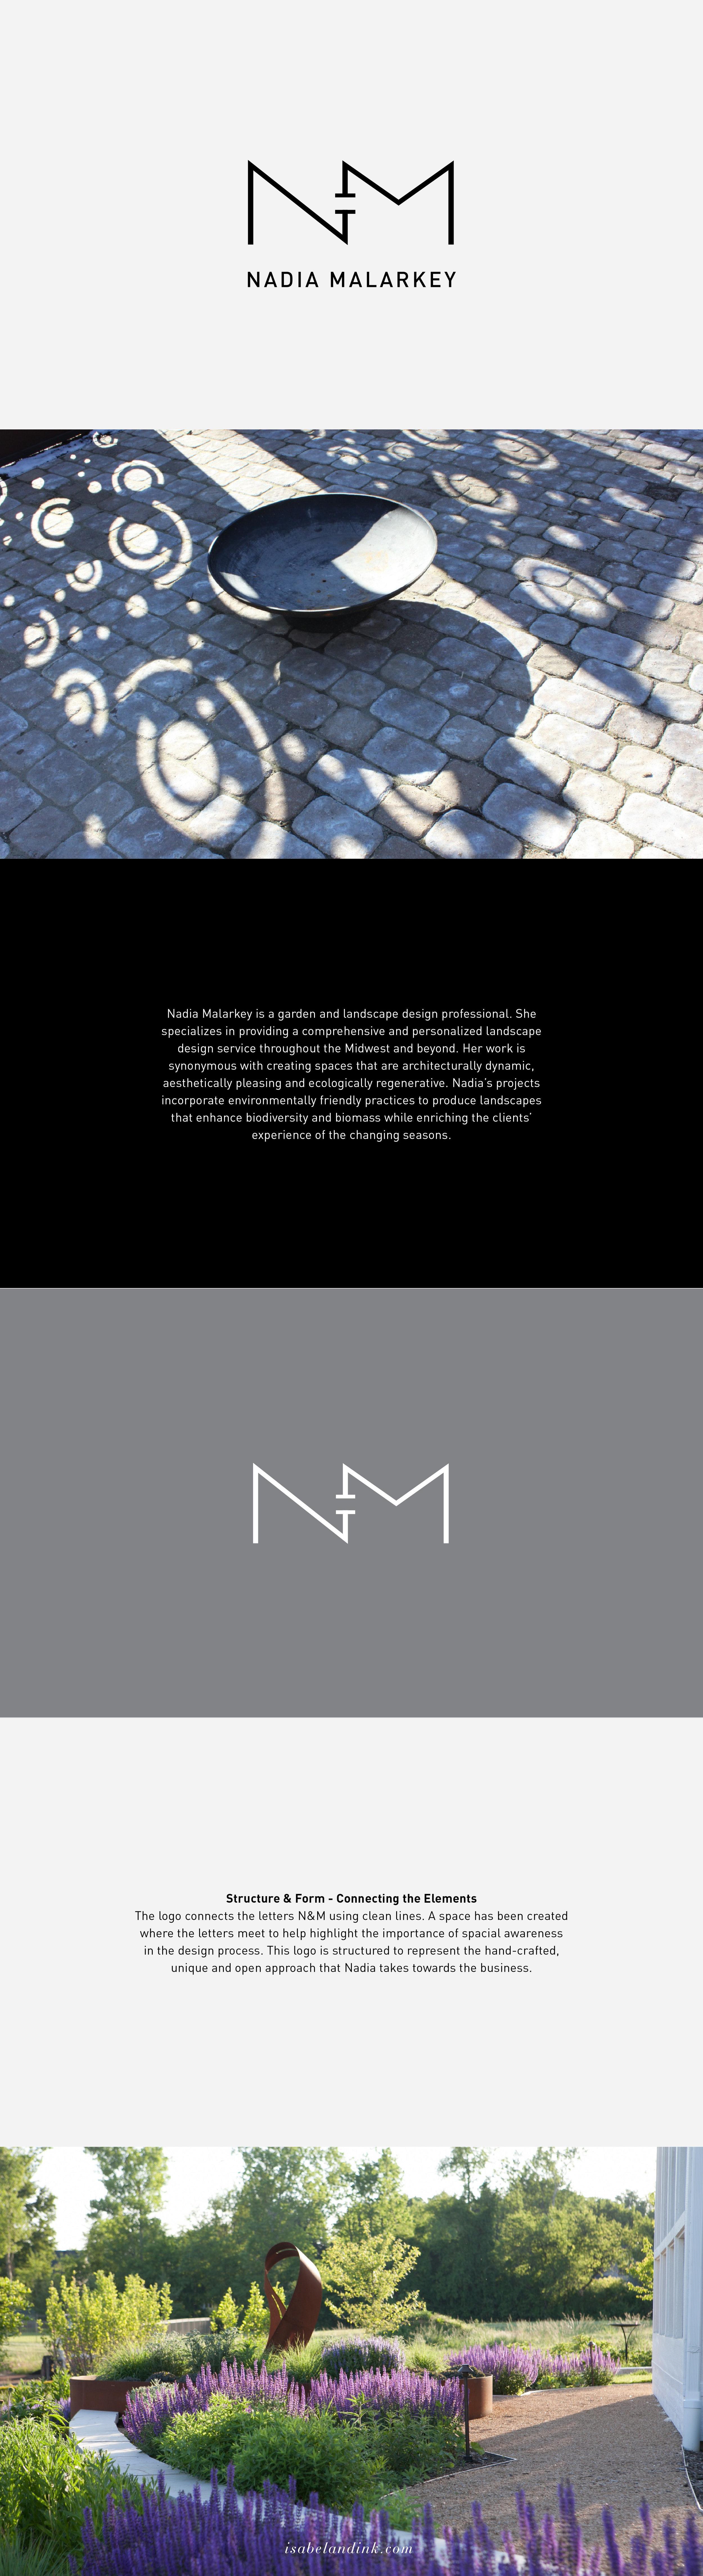 NM_New2018.jpg